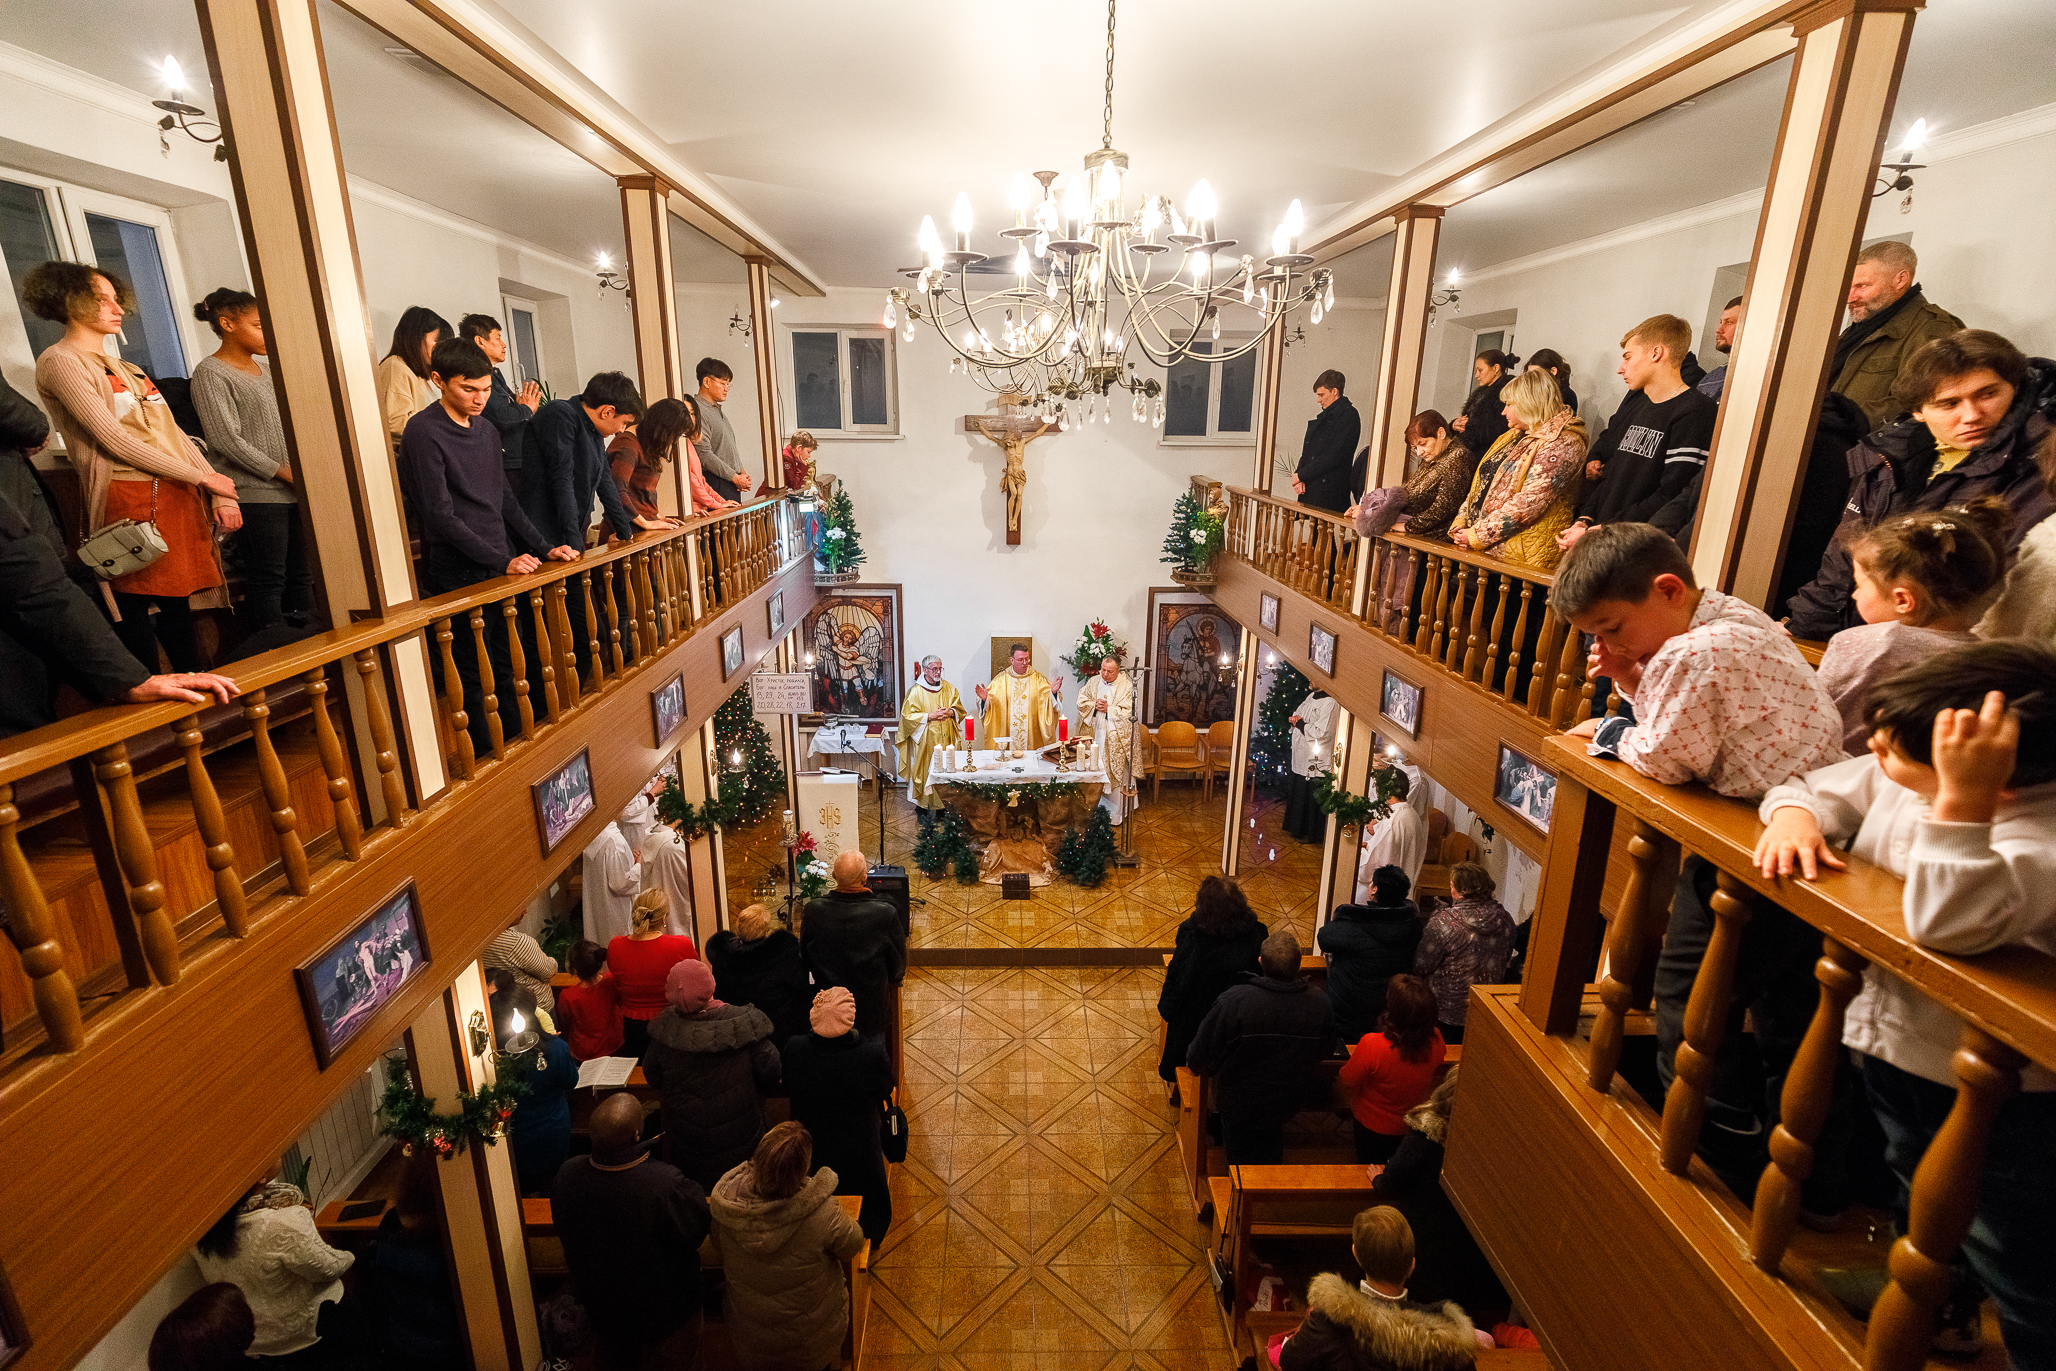 Kyrgyzstan – small Catholic communities between high mountains